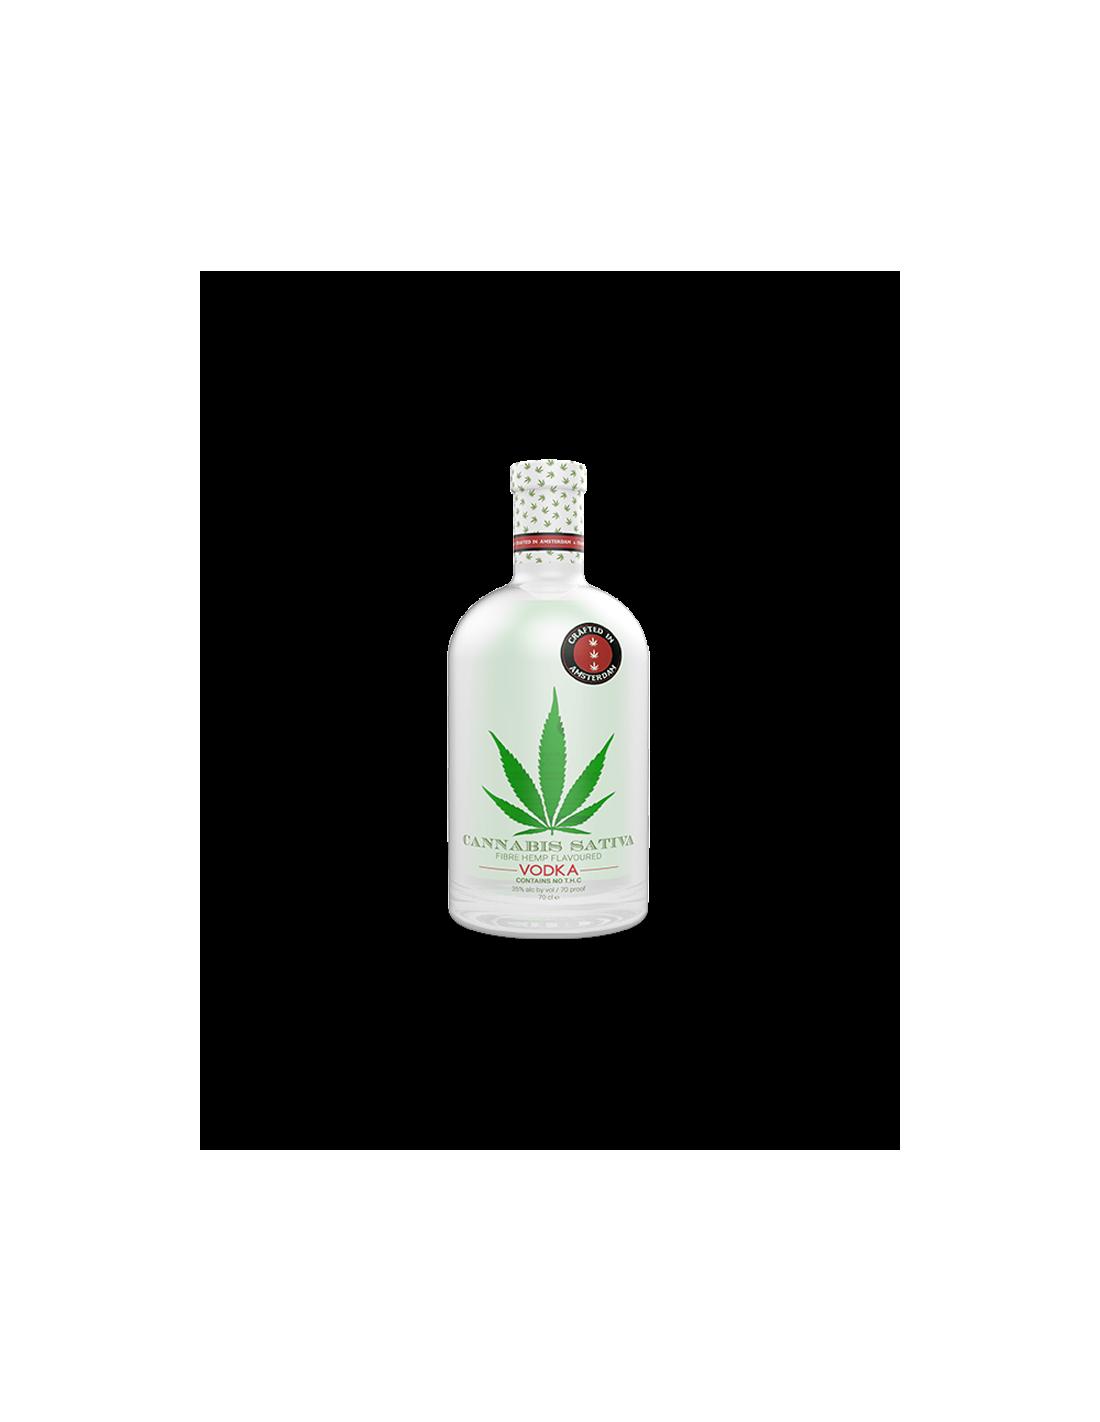 Vodca Cannabis Sativa 0.7L, 35% alc.